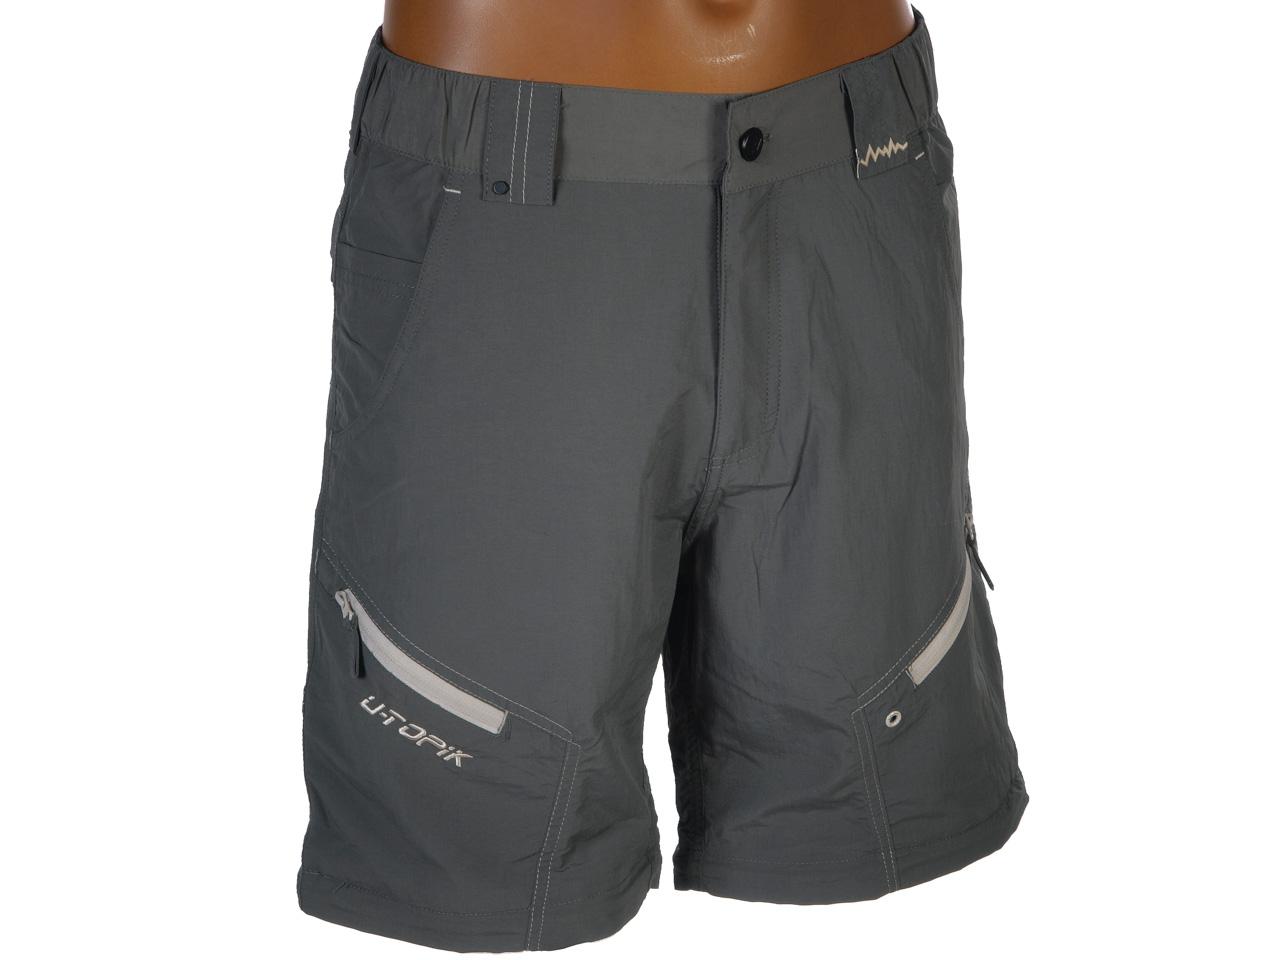 Pantalon-U-topik-Balbu-anth-pant-3en1-Gris-55678-Neuf